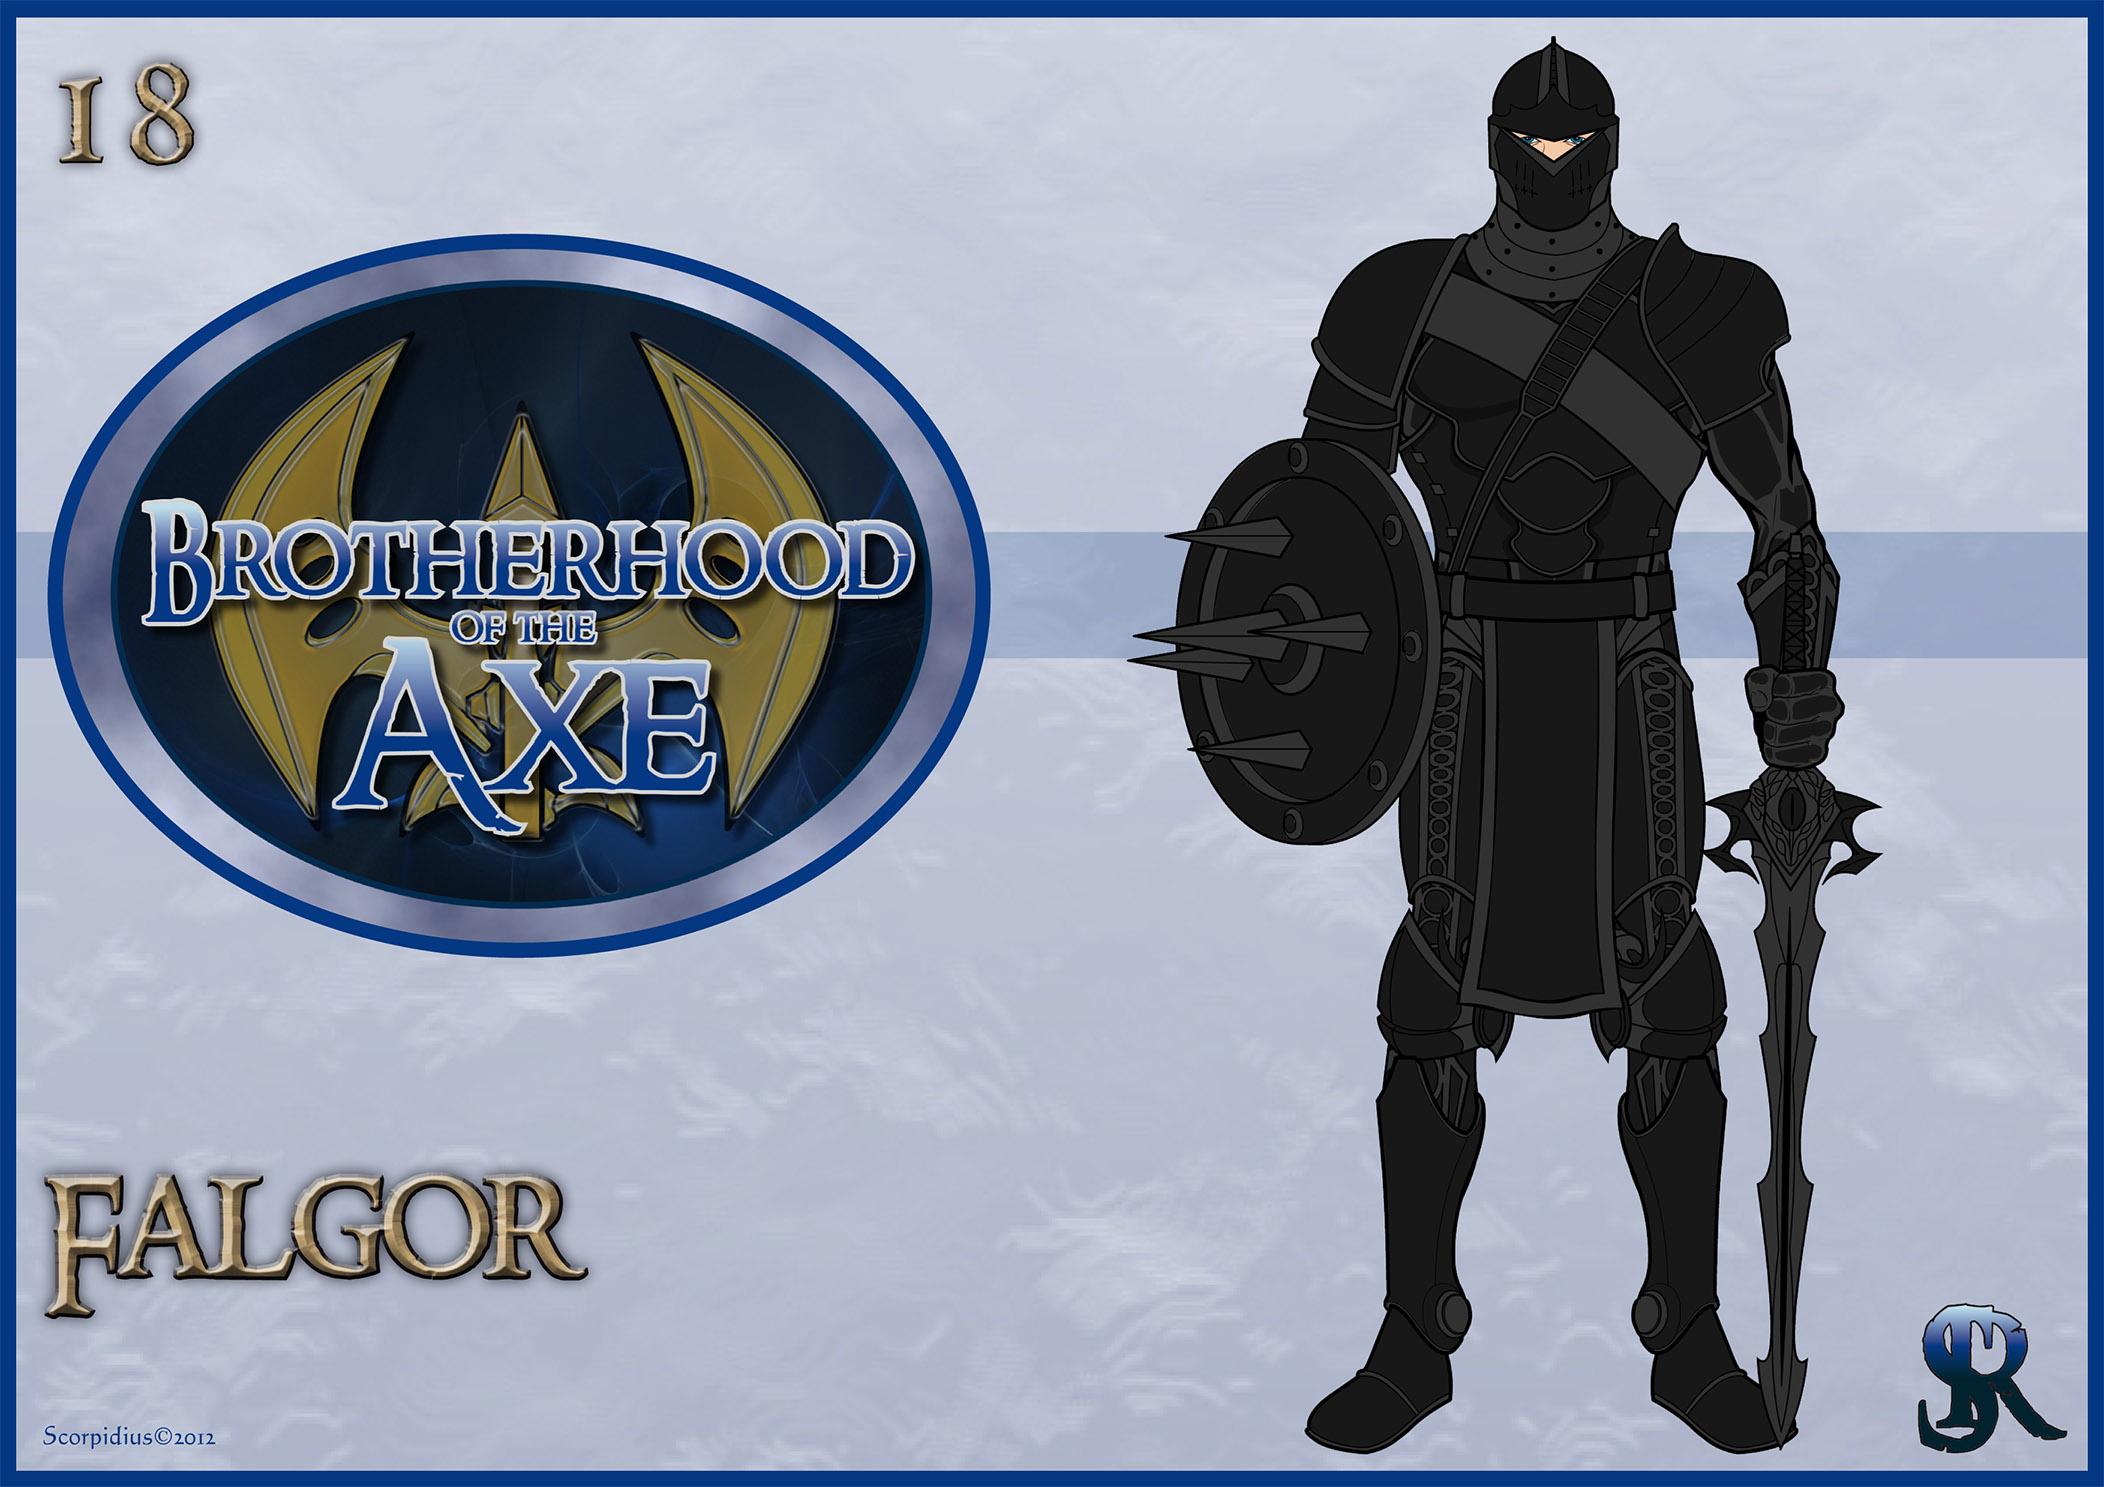 http://www.heromachine.com/wp-content/legacy/forum-image-uploads/scorpidius/2012/03/018-Falgor.jpg